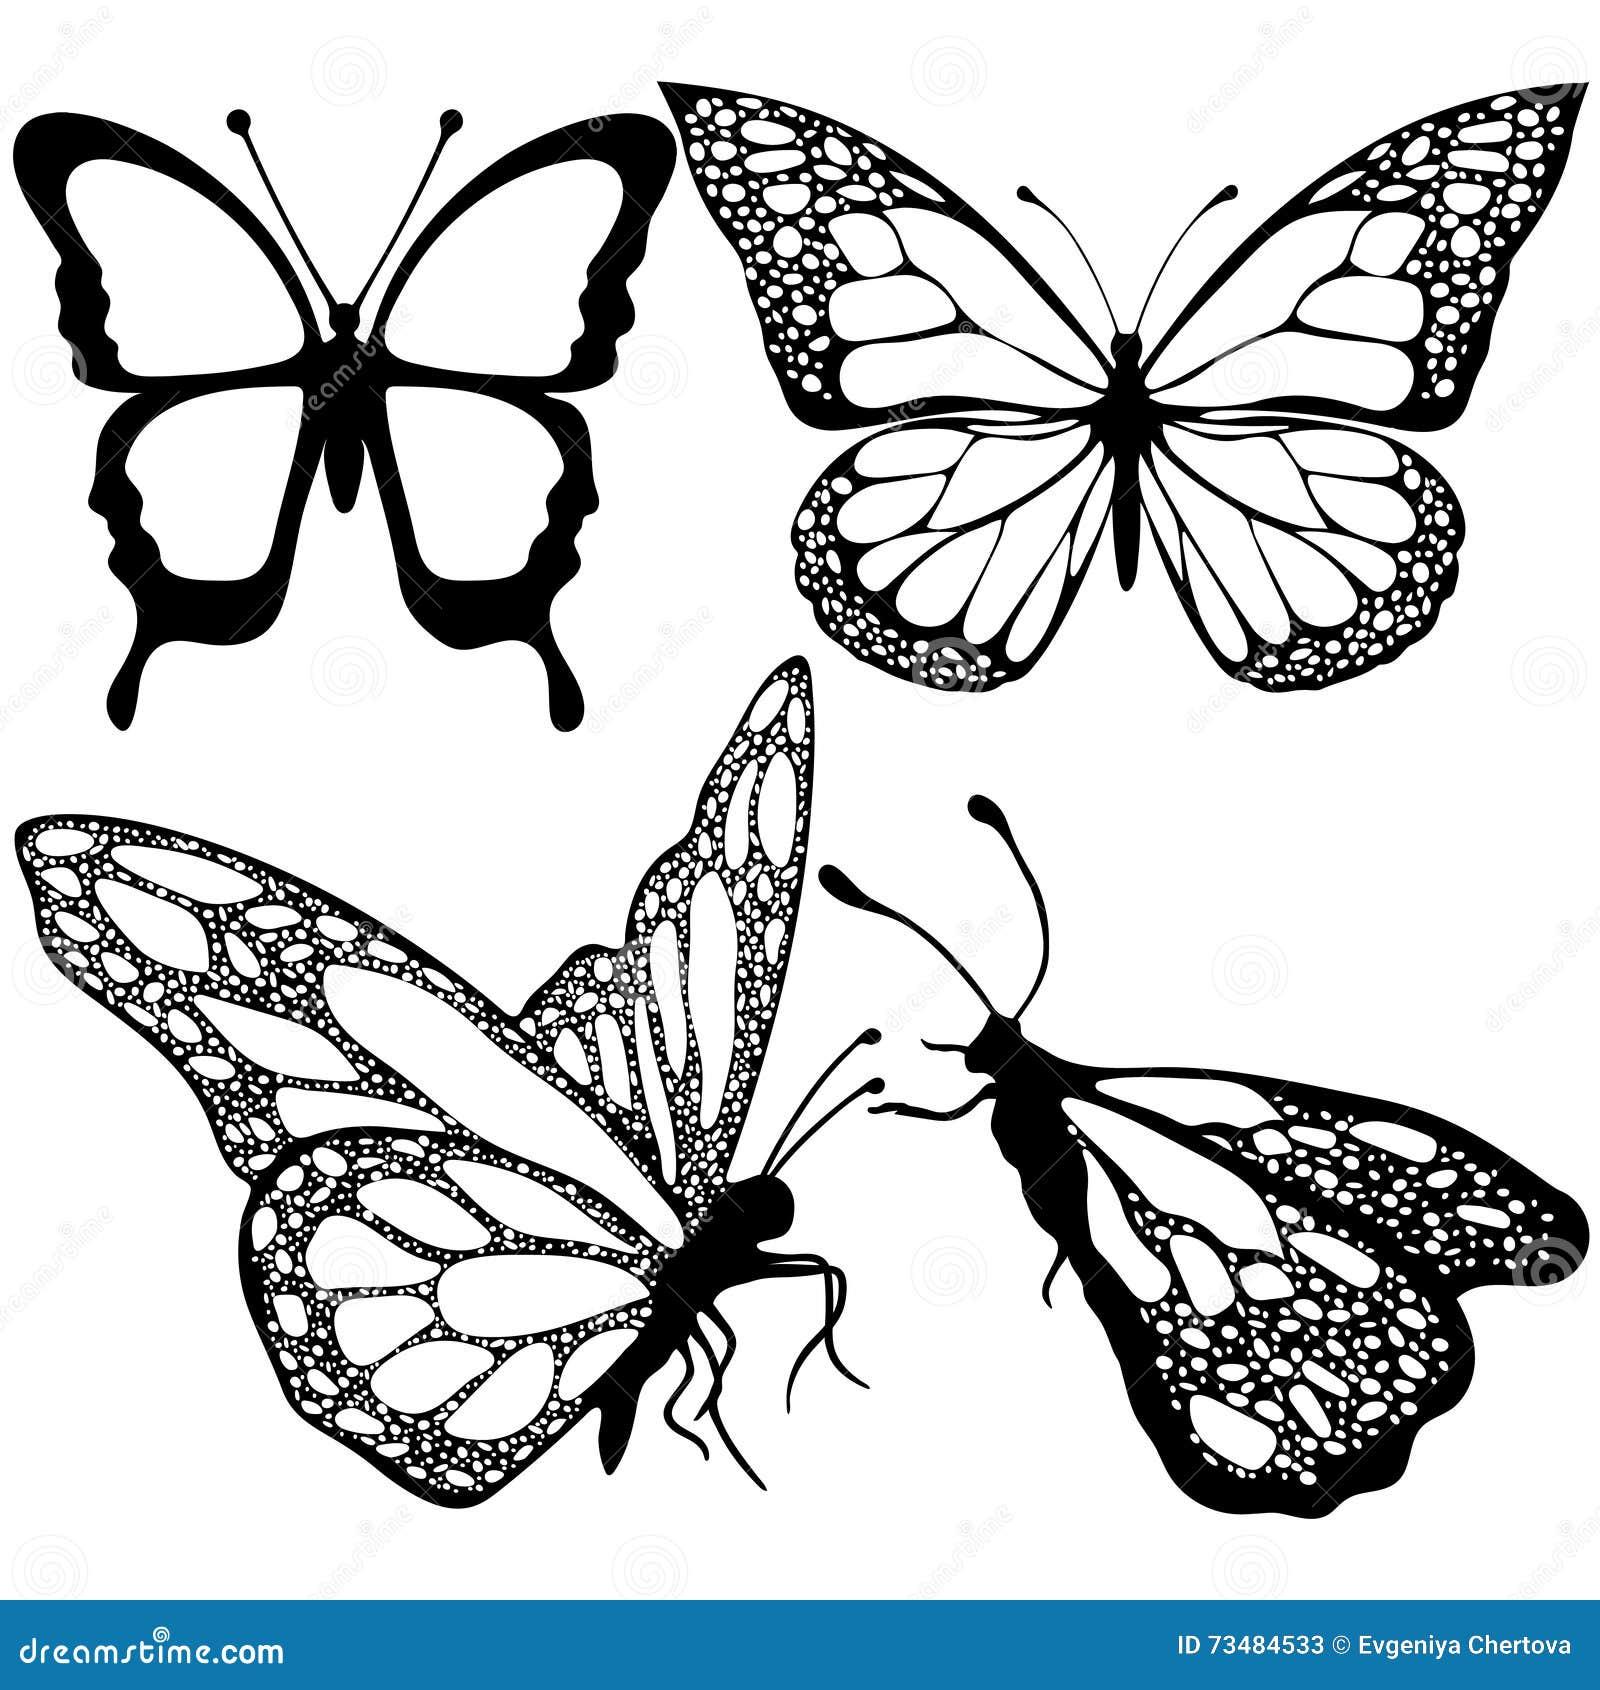 Las Mariposas Fijaron, Monocromo, Libro De Colorear, Ejemplo Blanco ...